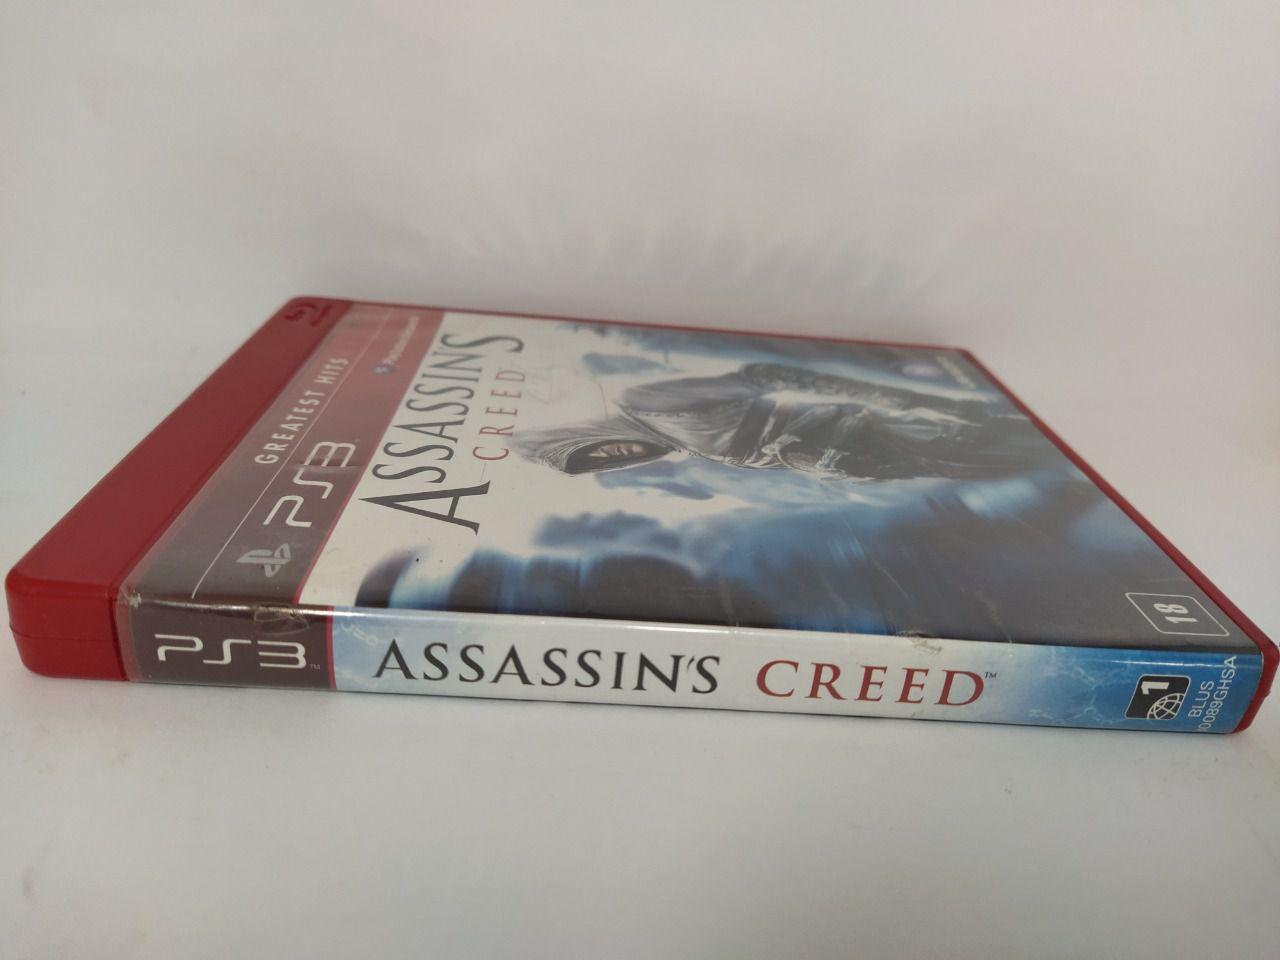 Jogo Ps3 Assassin's Creed Mídia Física Usado